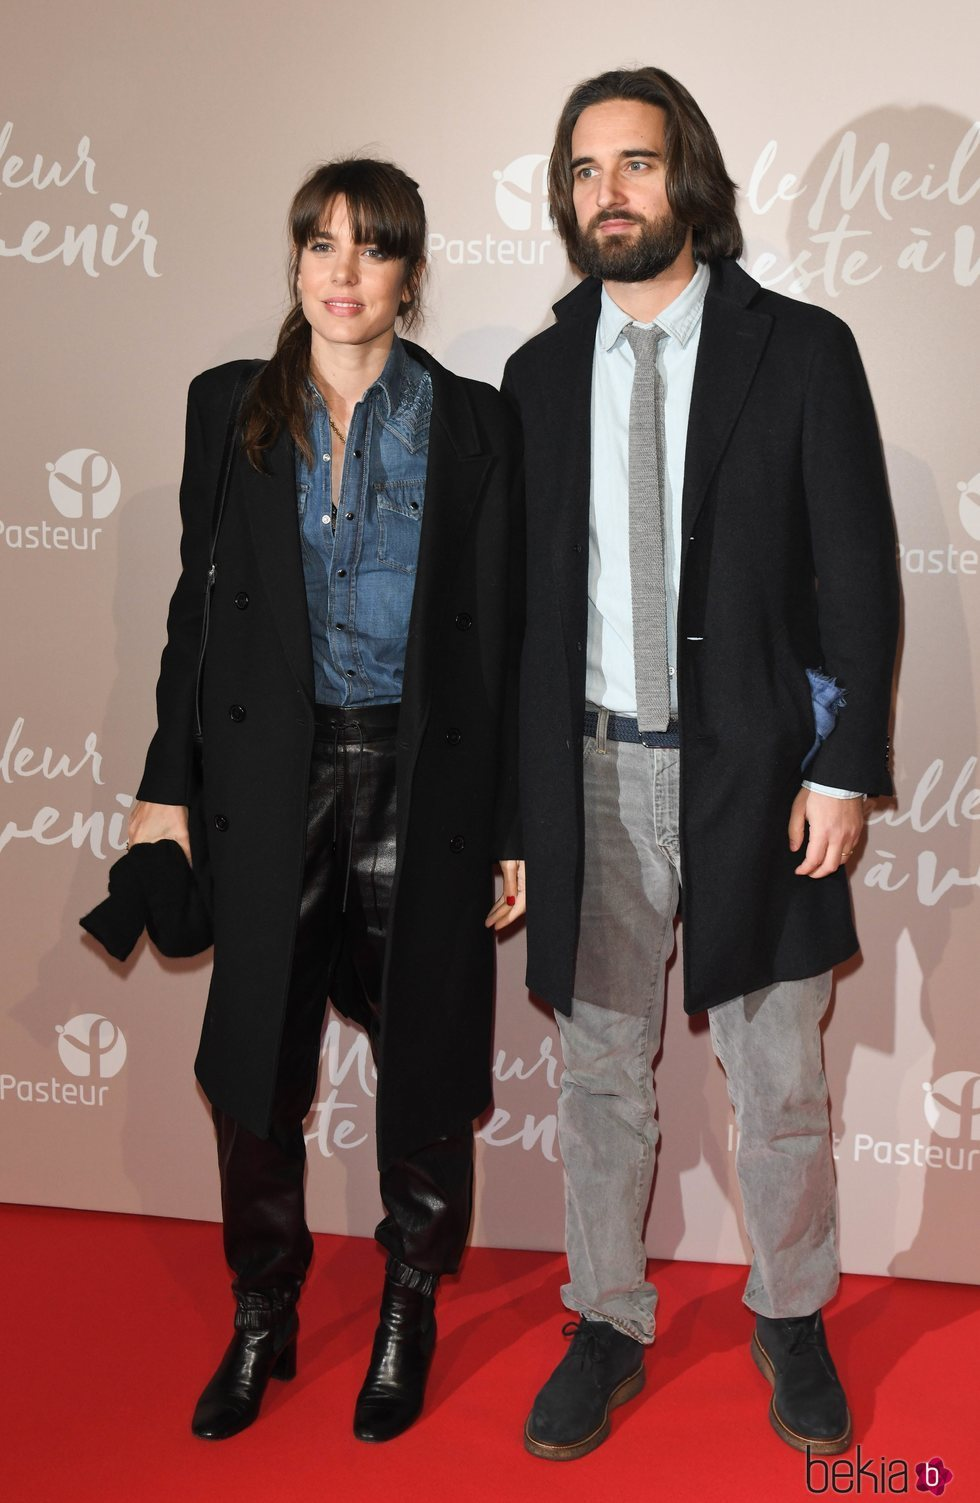 Carlota Casiraghi y Dimitri Rassam en el estreno de 'Le meilleur reste à venir'